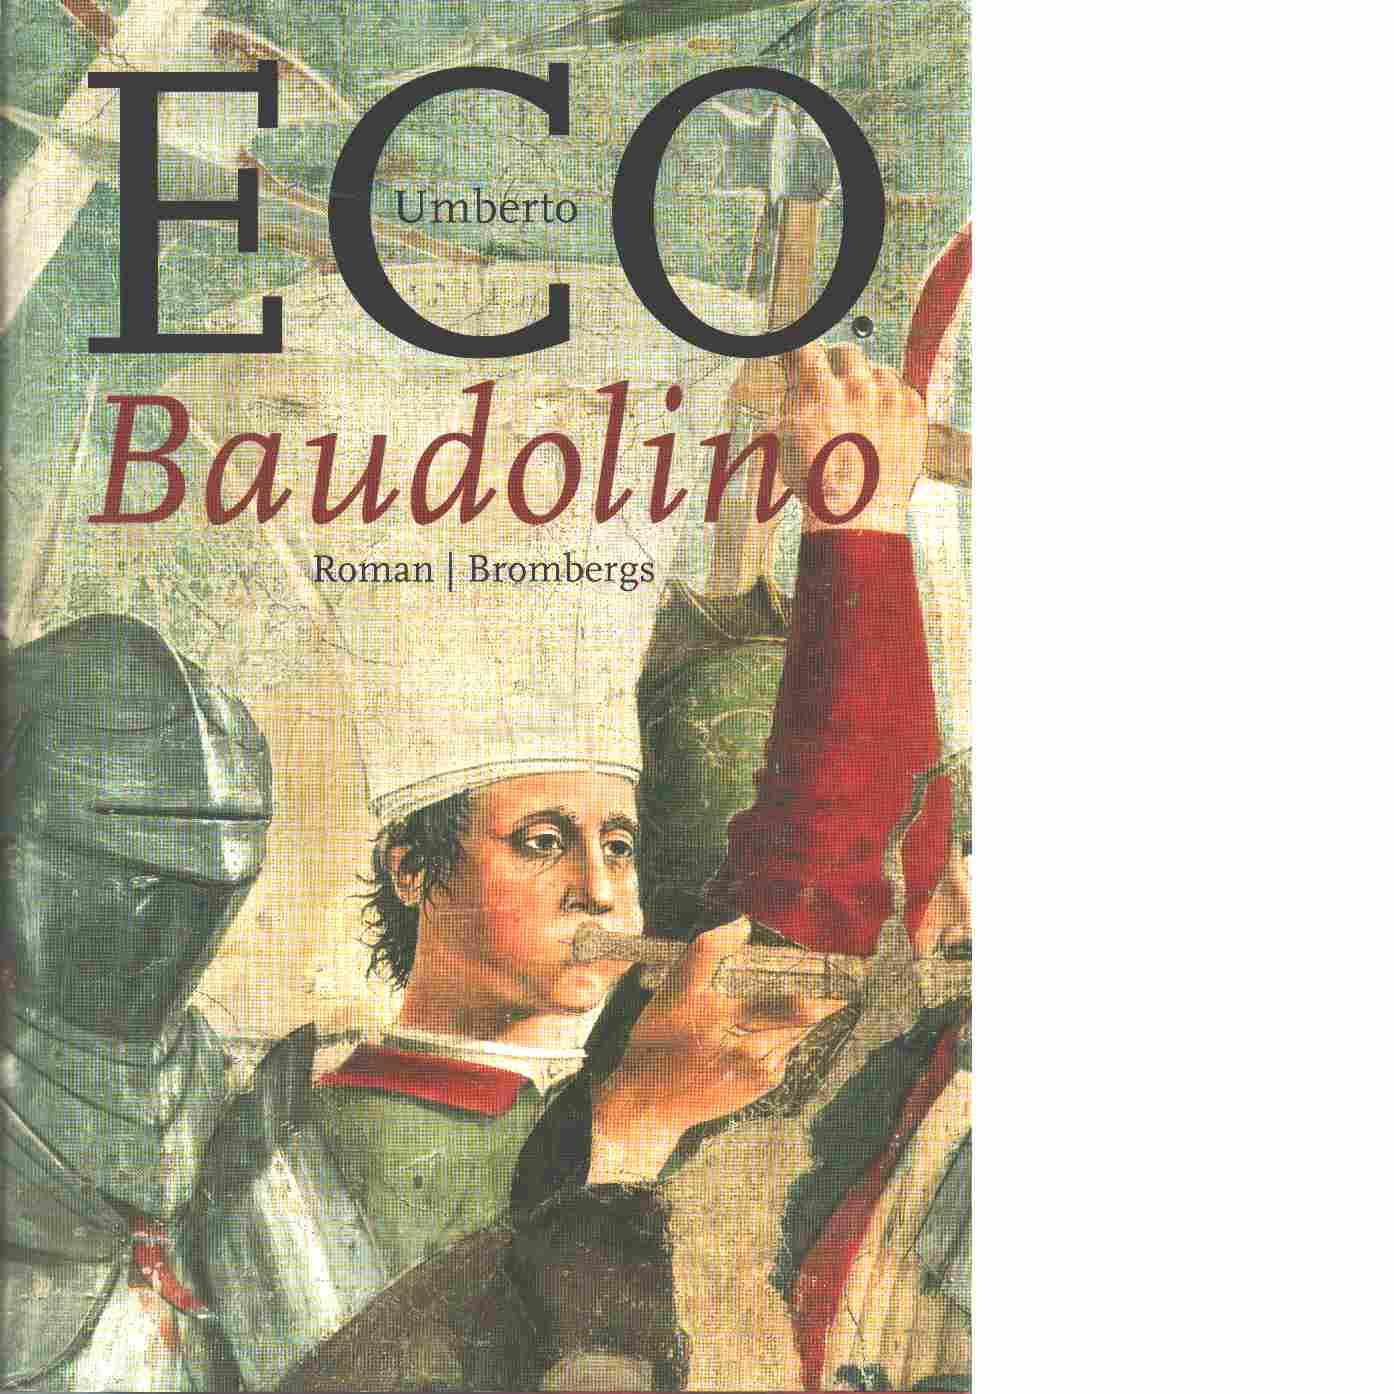 Baudolino : roman - Eco, Umberto